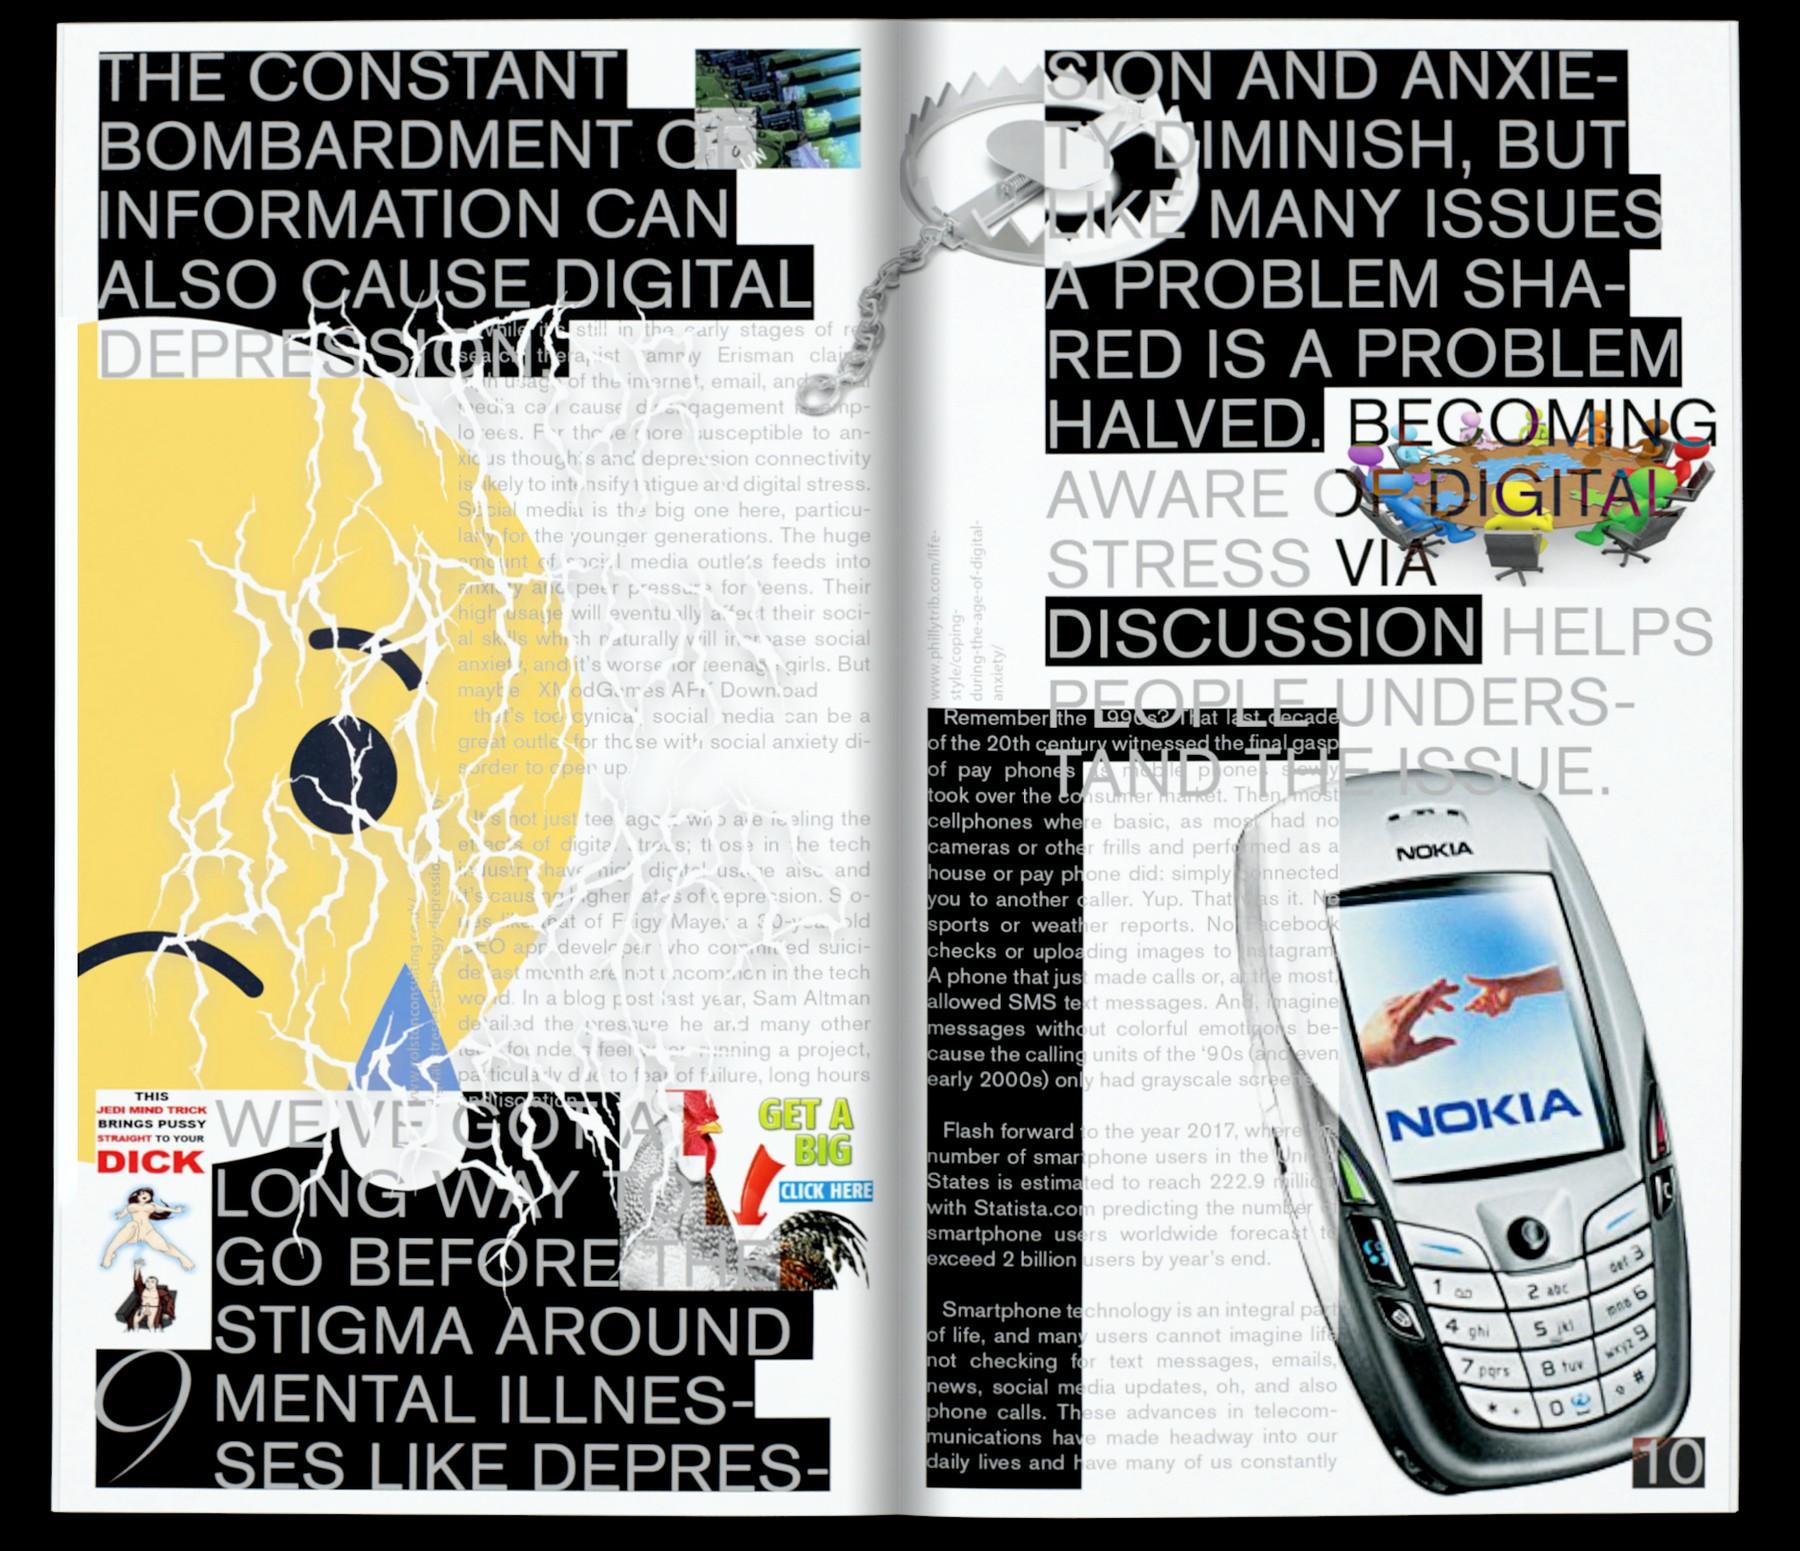 digital-anxiety-4.jpg